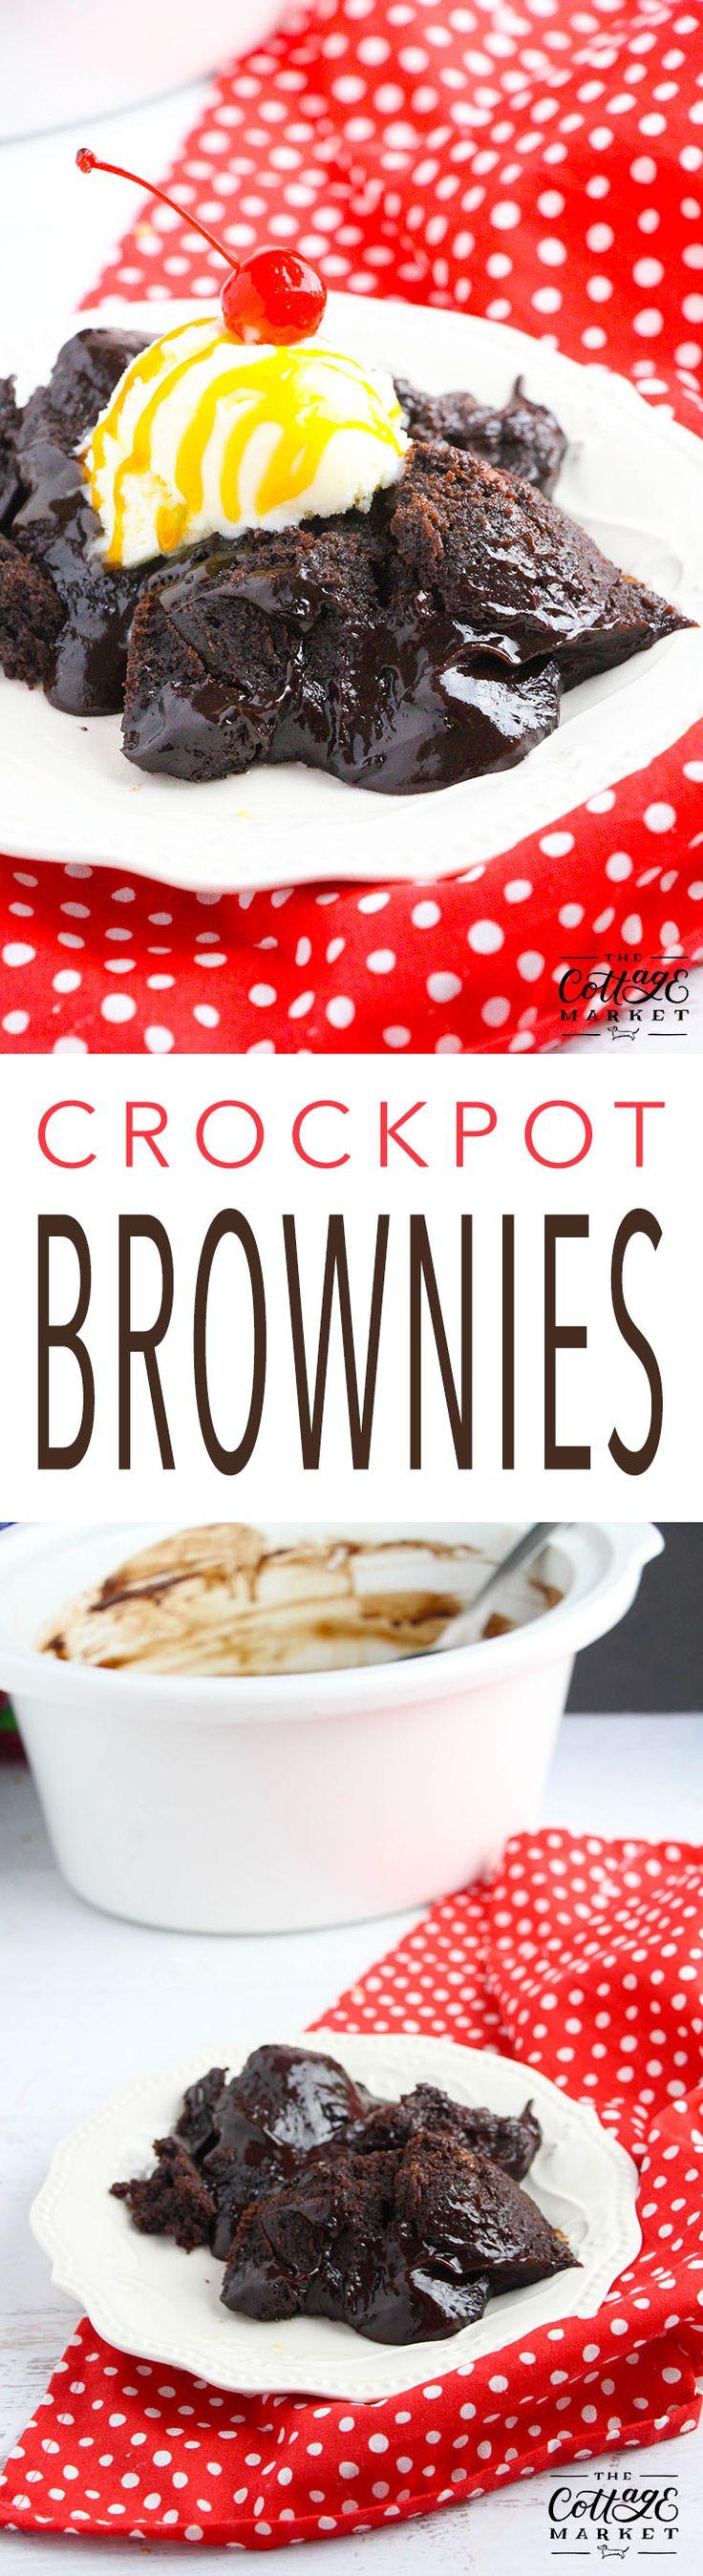 Crazy Easy Crock-Pot Brownies - The Cottage Market